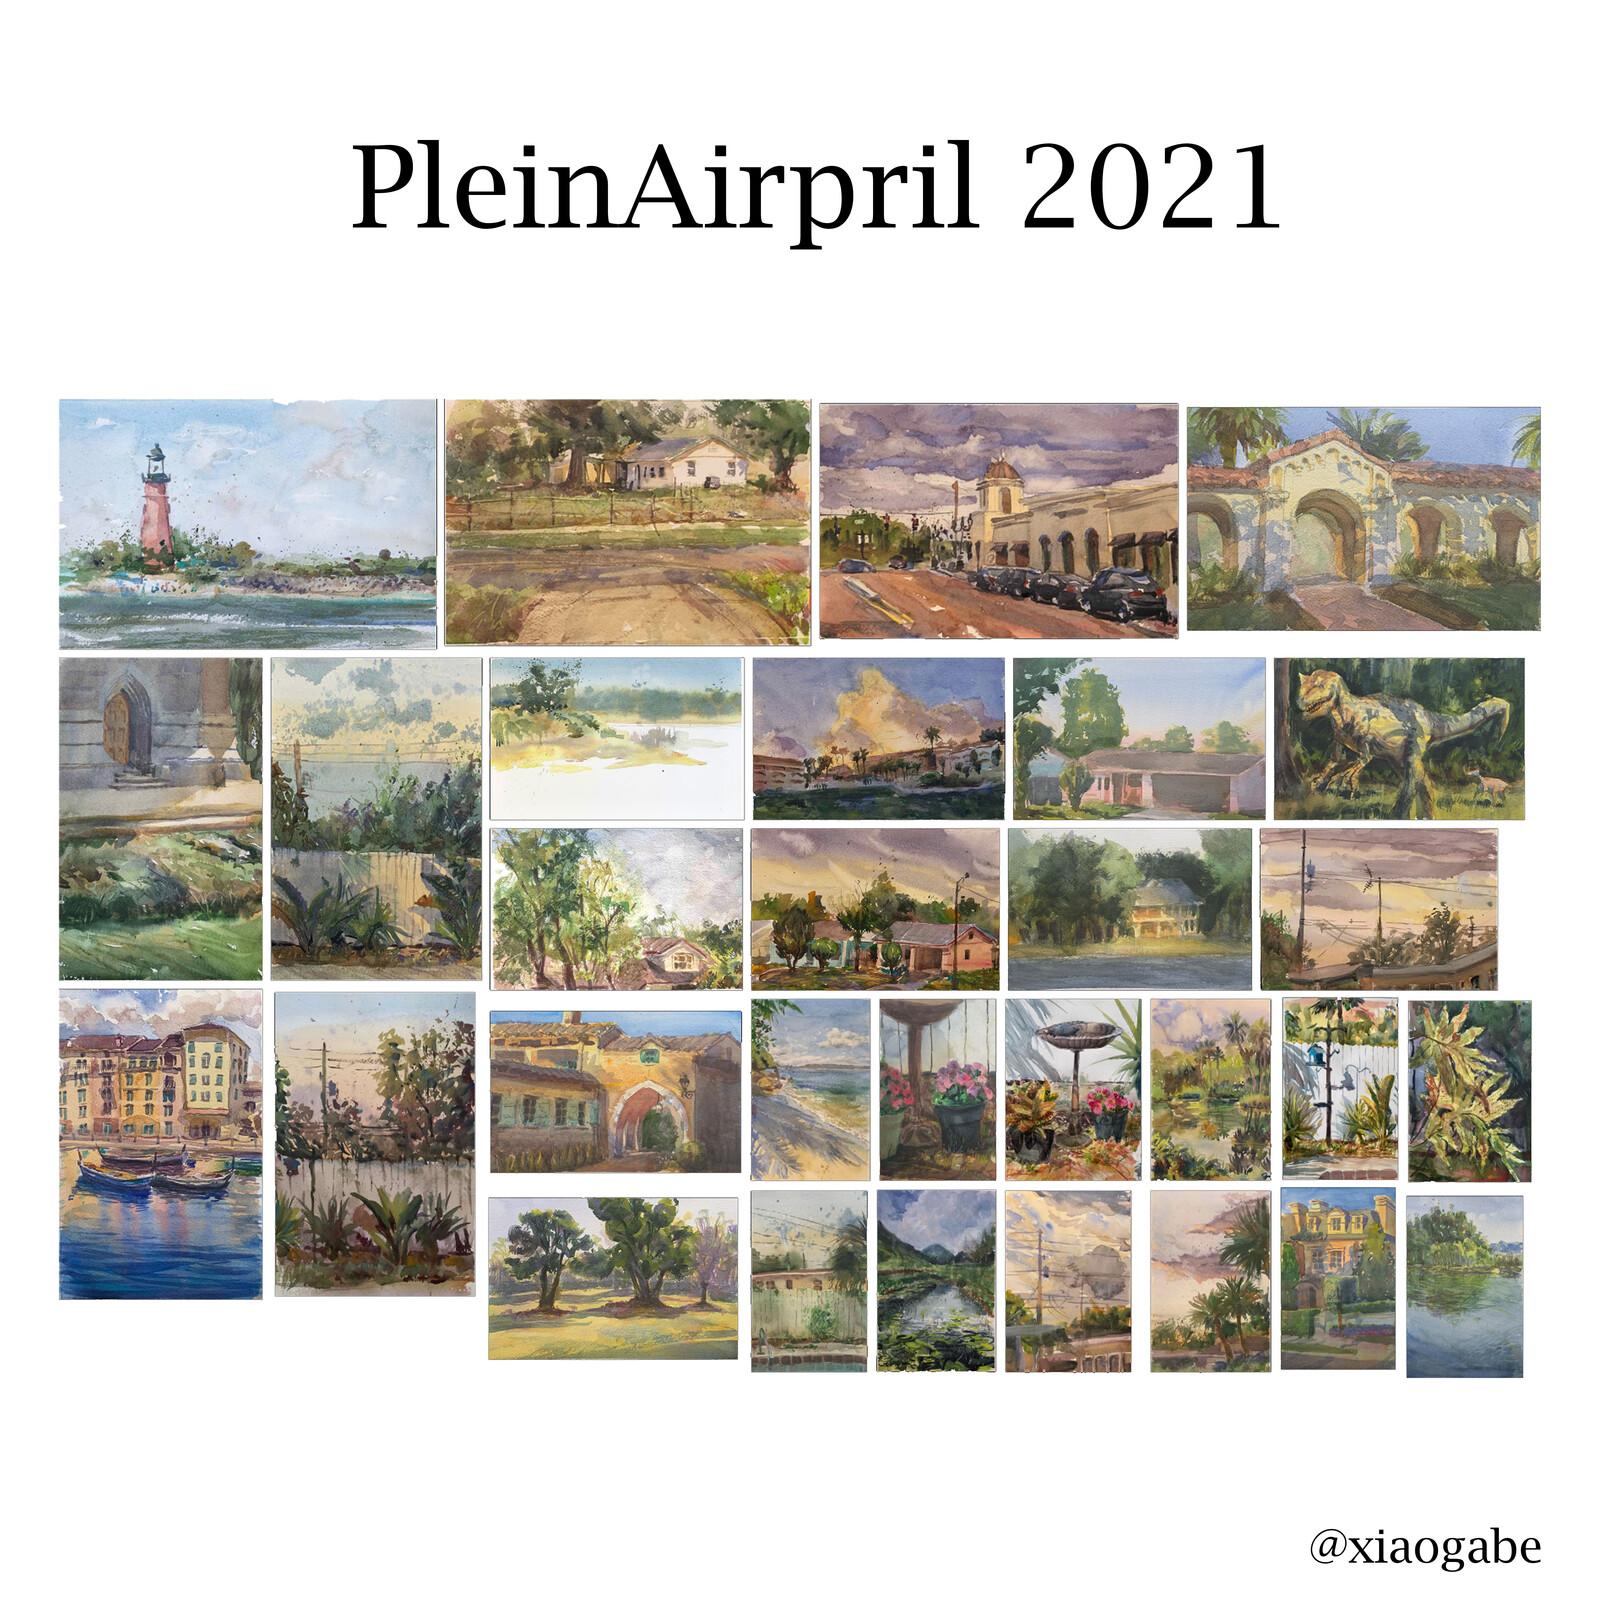 Plein Airpril 2021